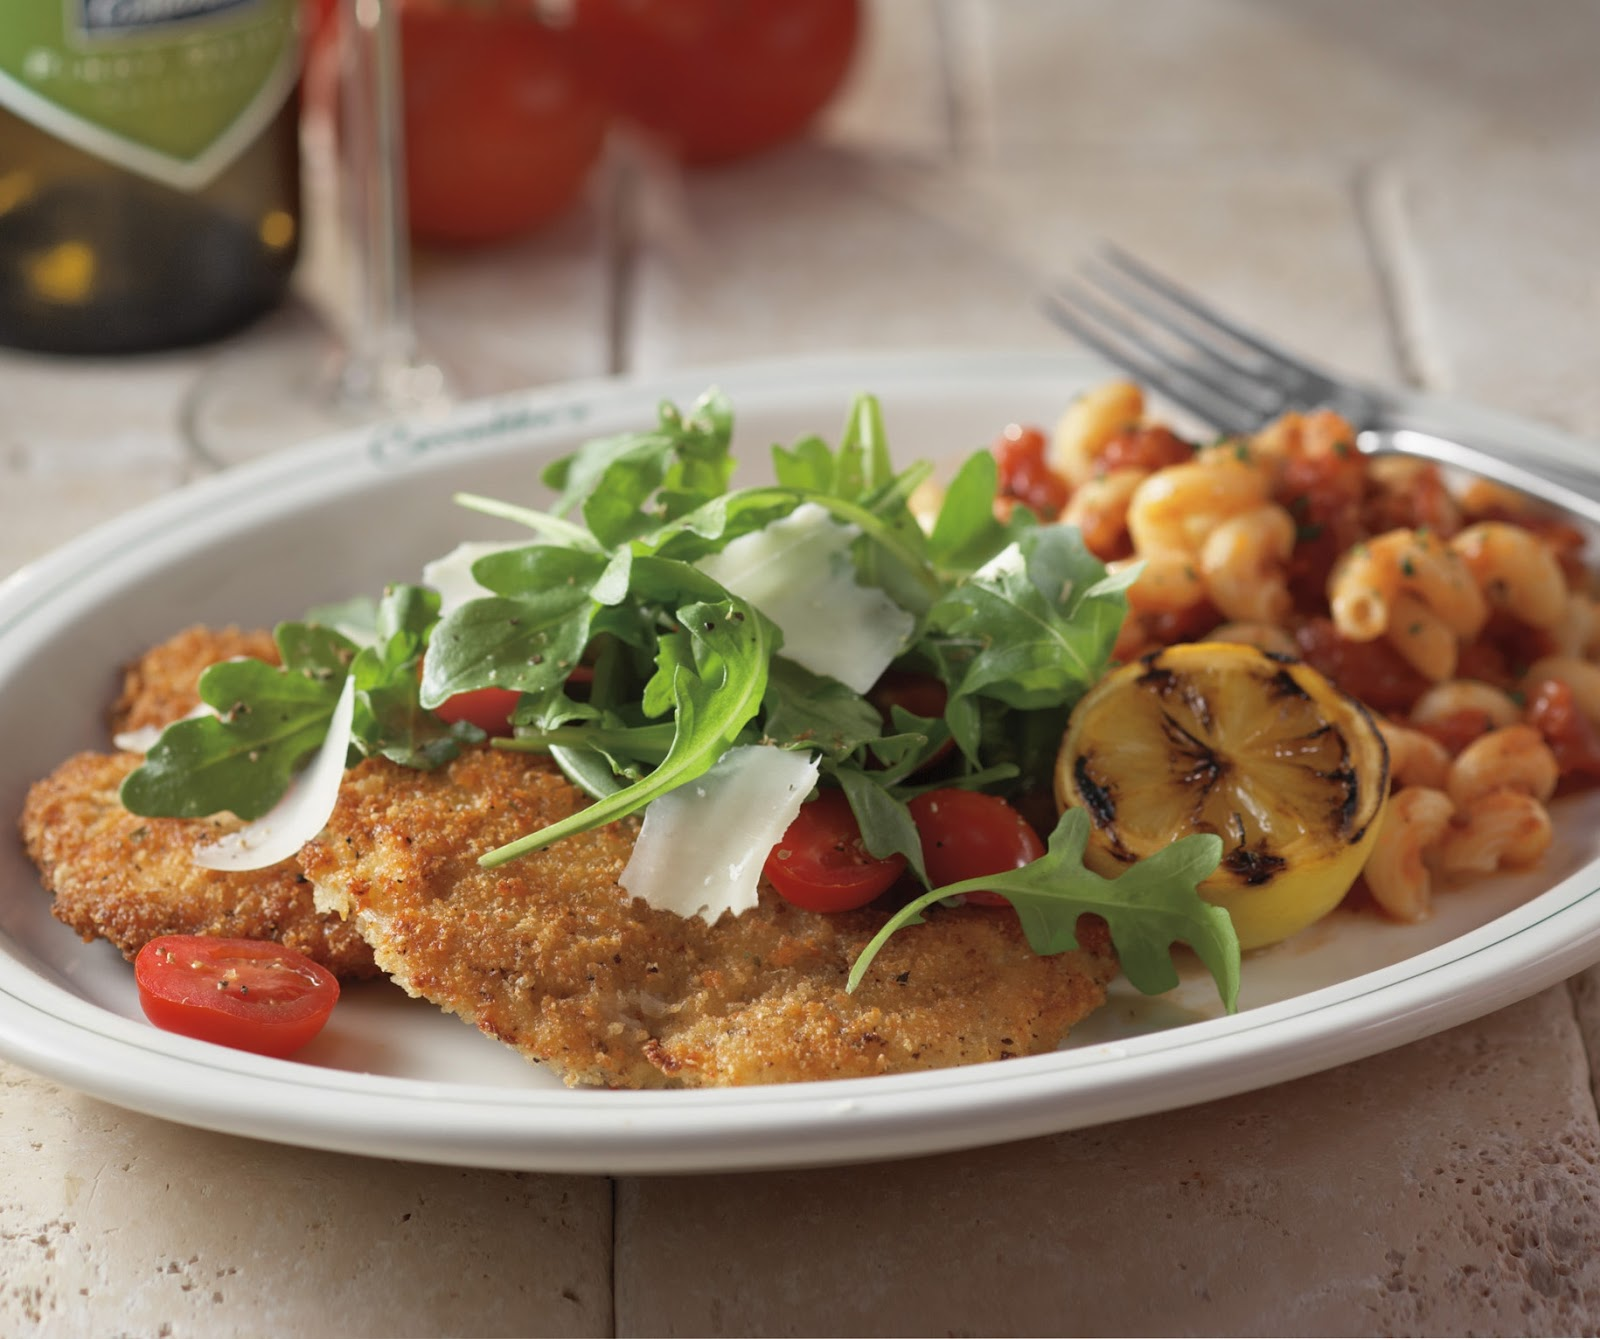 carrabba's italian grill copycat recipes: parmesan crusted chicken